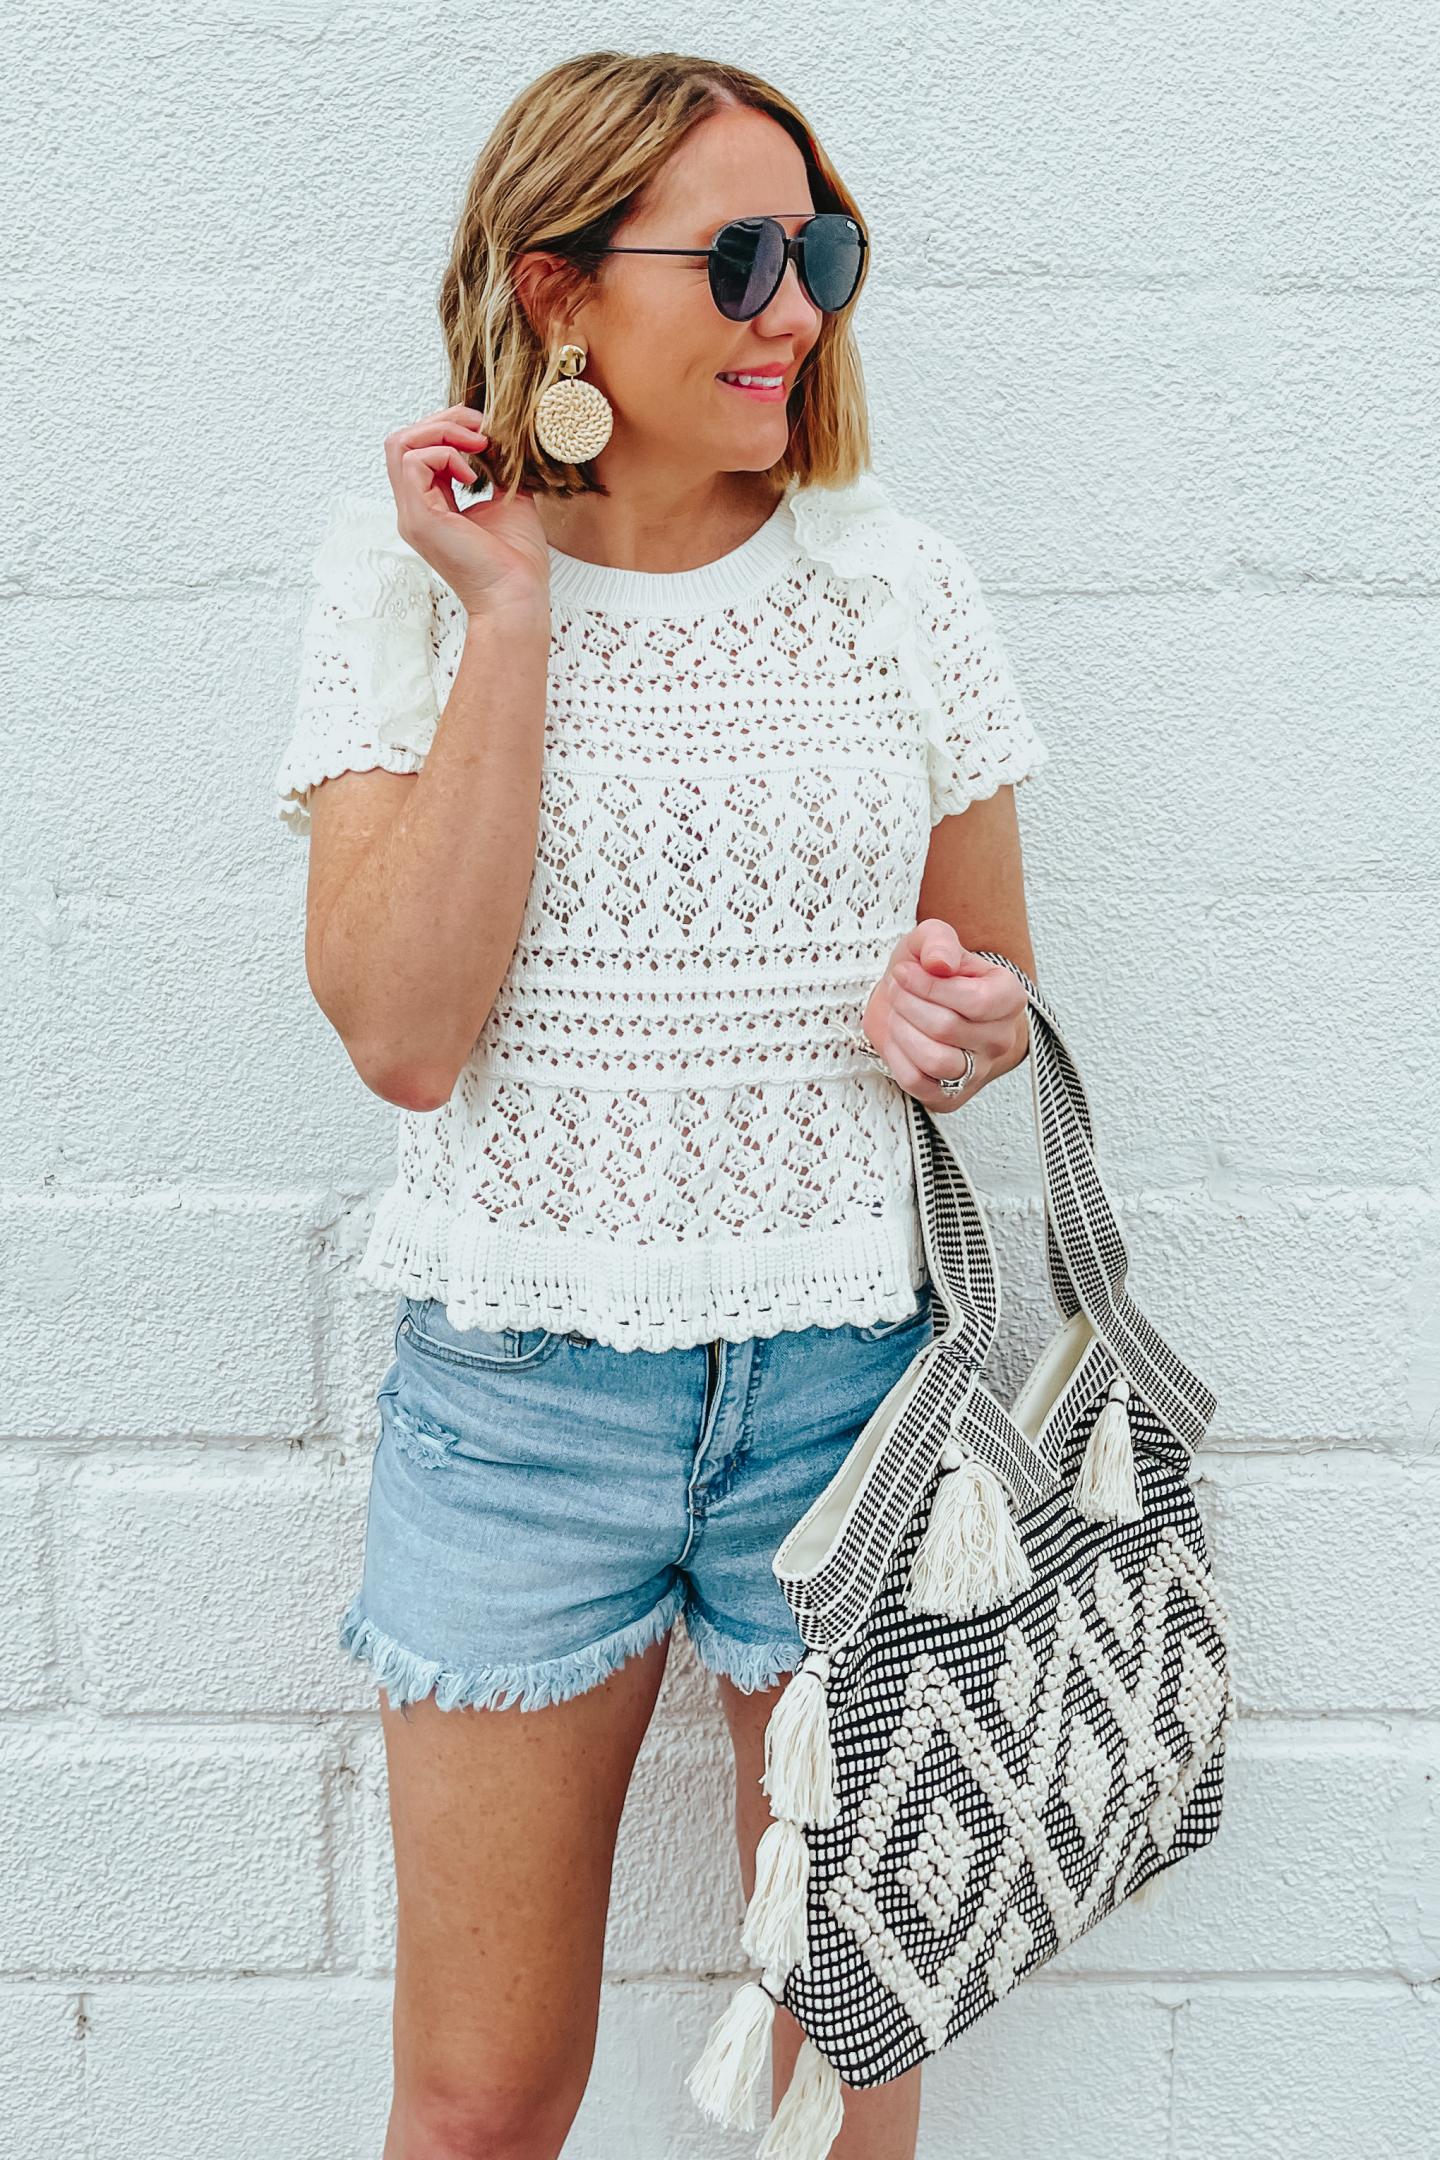 Five Ways to Style Denim Shorts, Scoop cutoff shorts, crochet eyelet ruffle sweater tee, Twig & Arrow woven tote